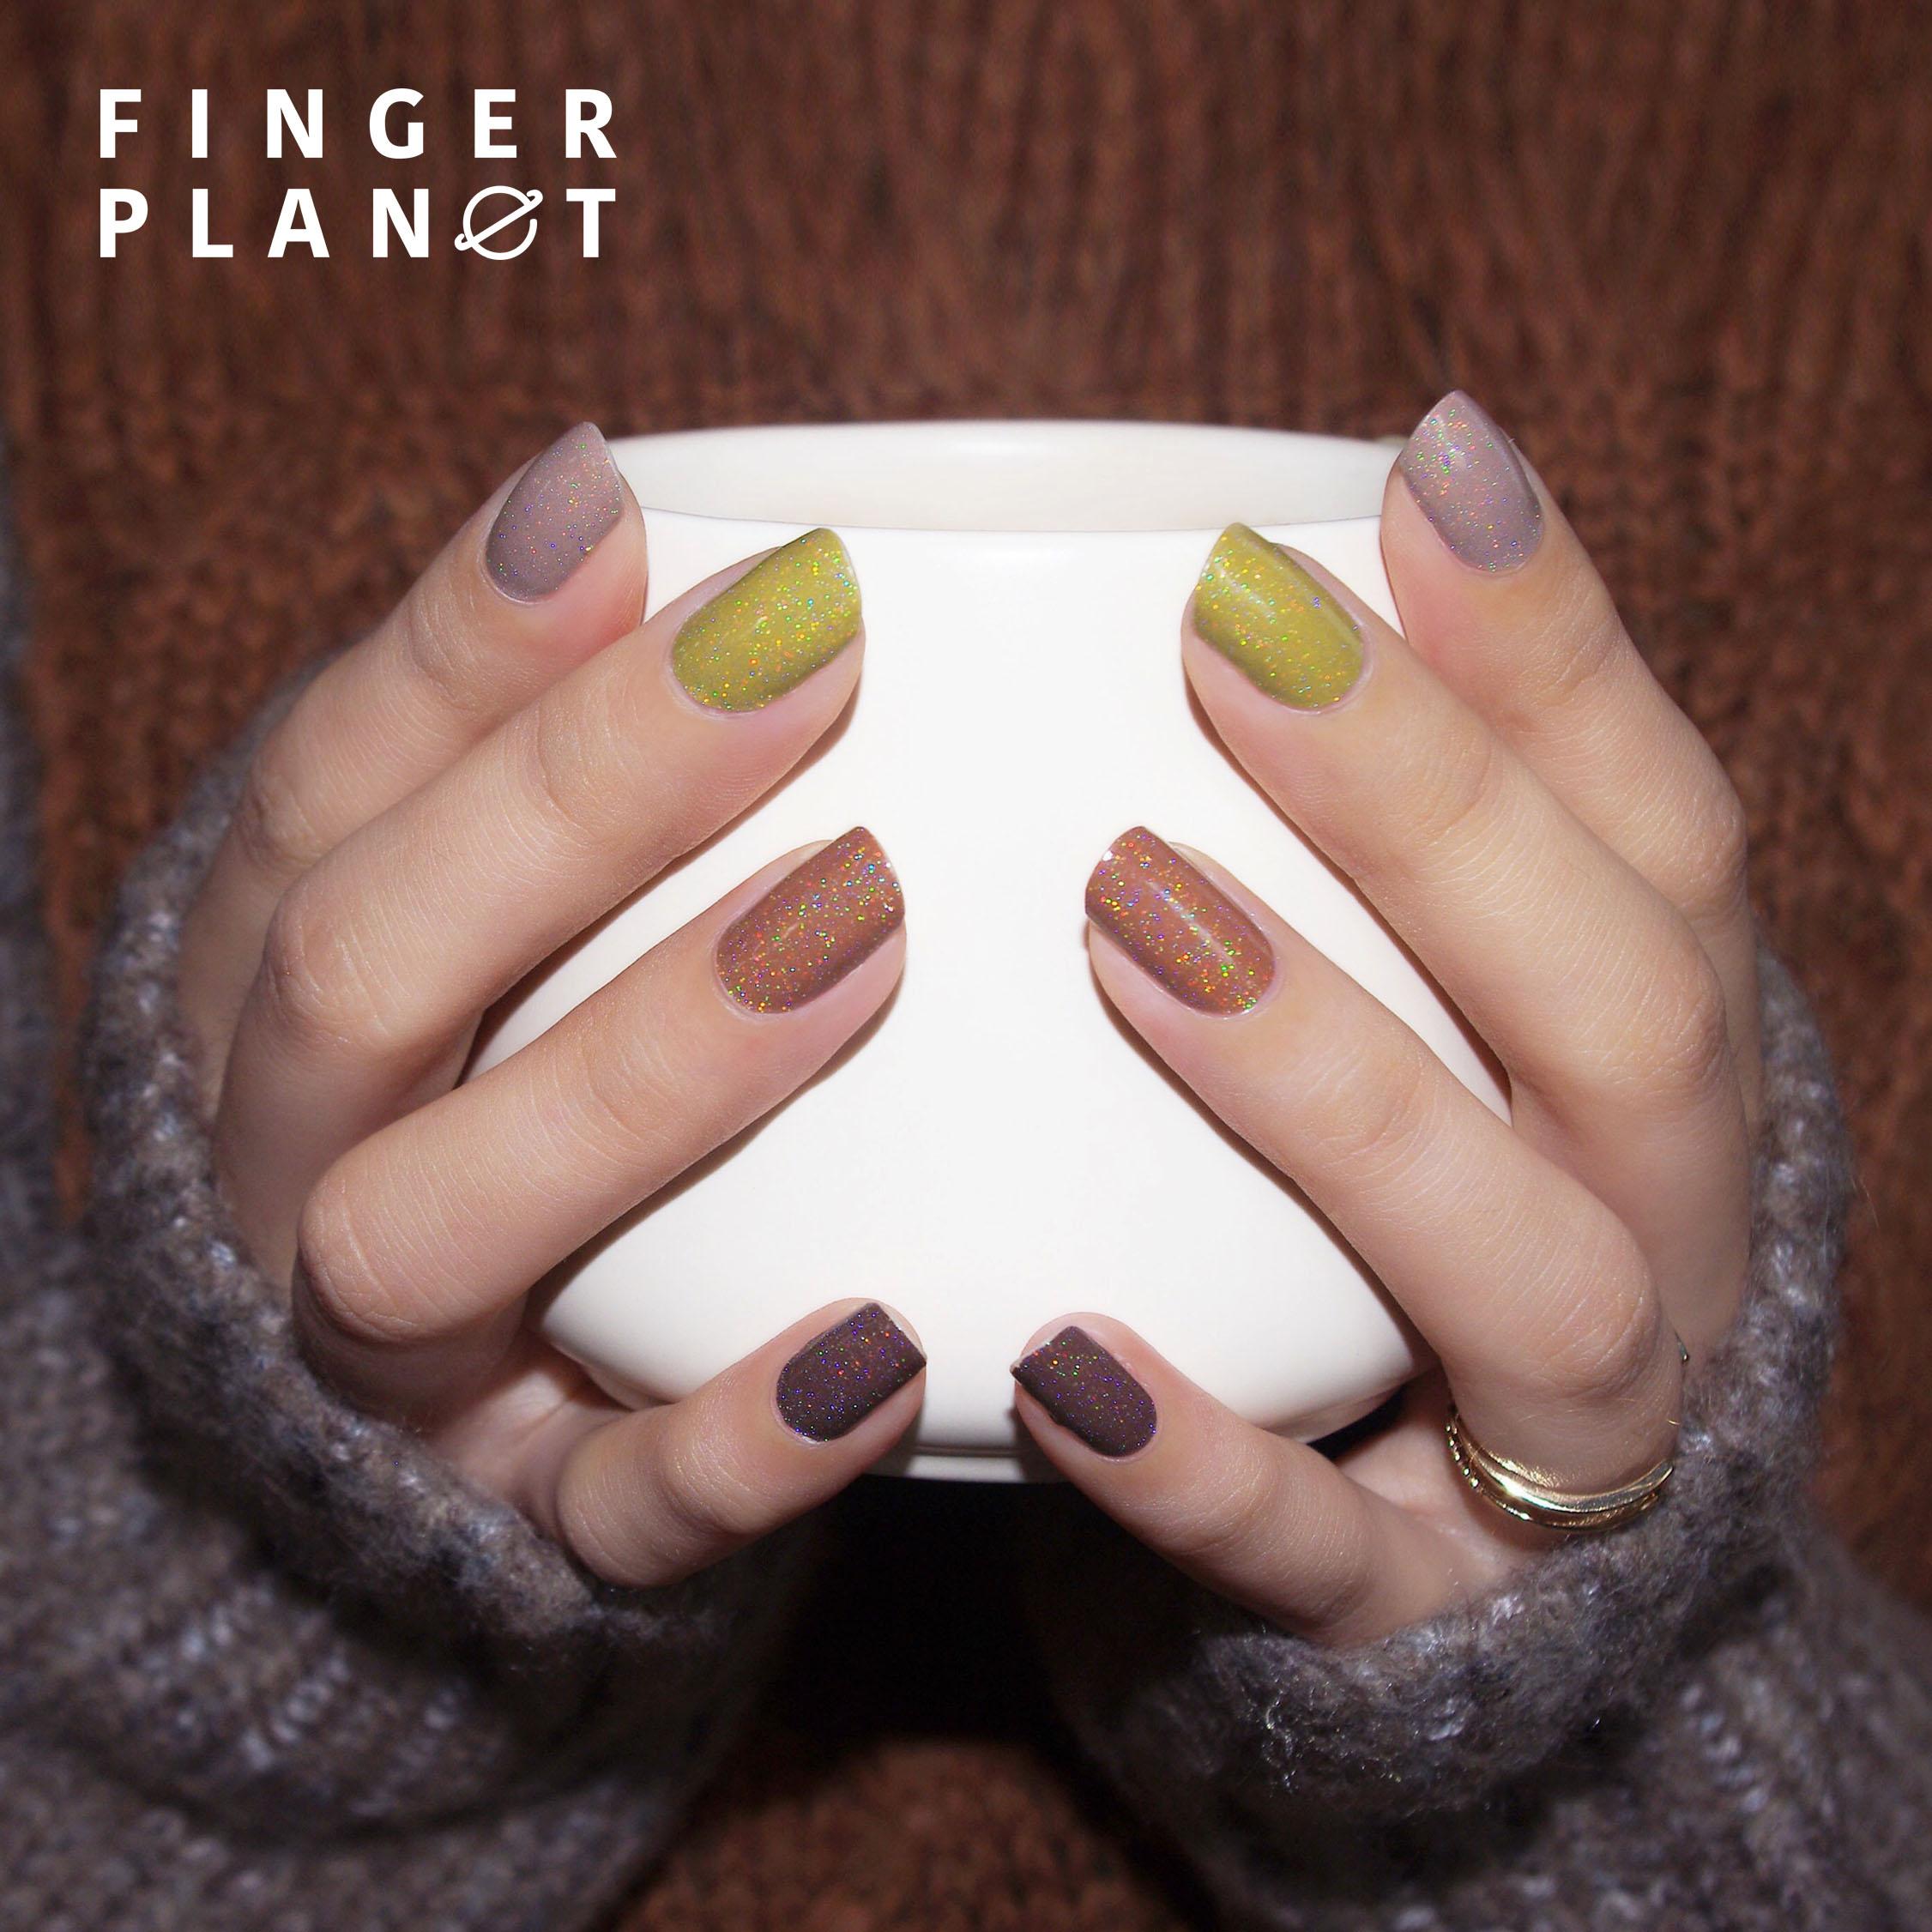 Planet FINGERPLANET Manicure Nail polish nail polish nail polish Nail Manicure